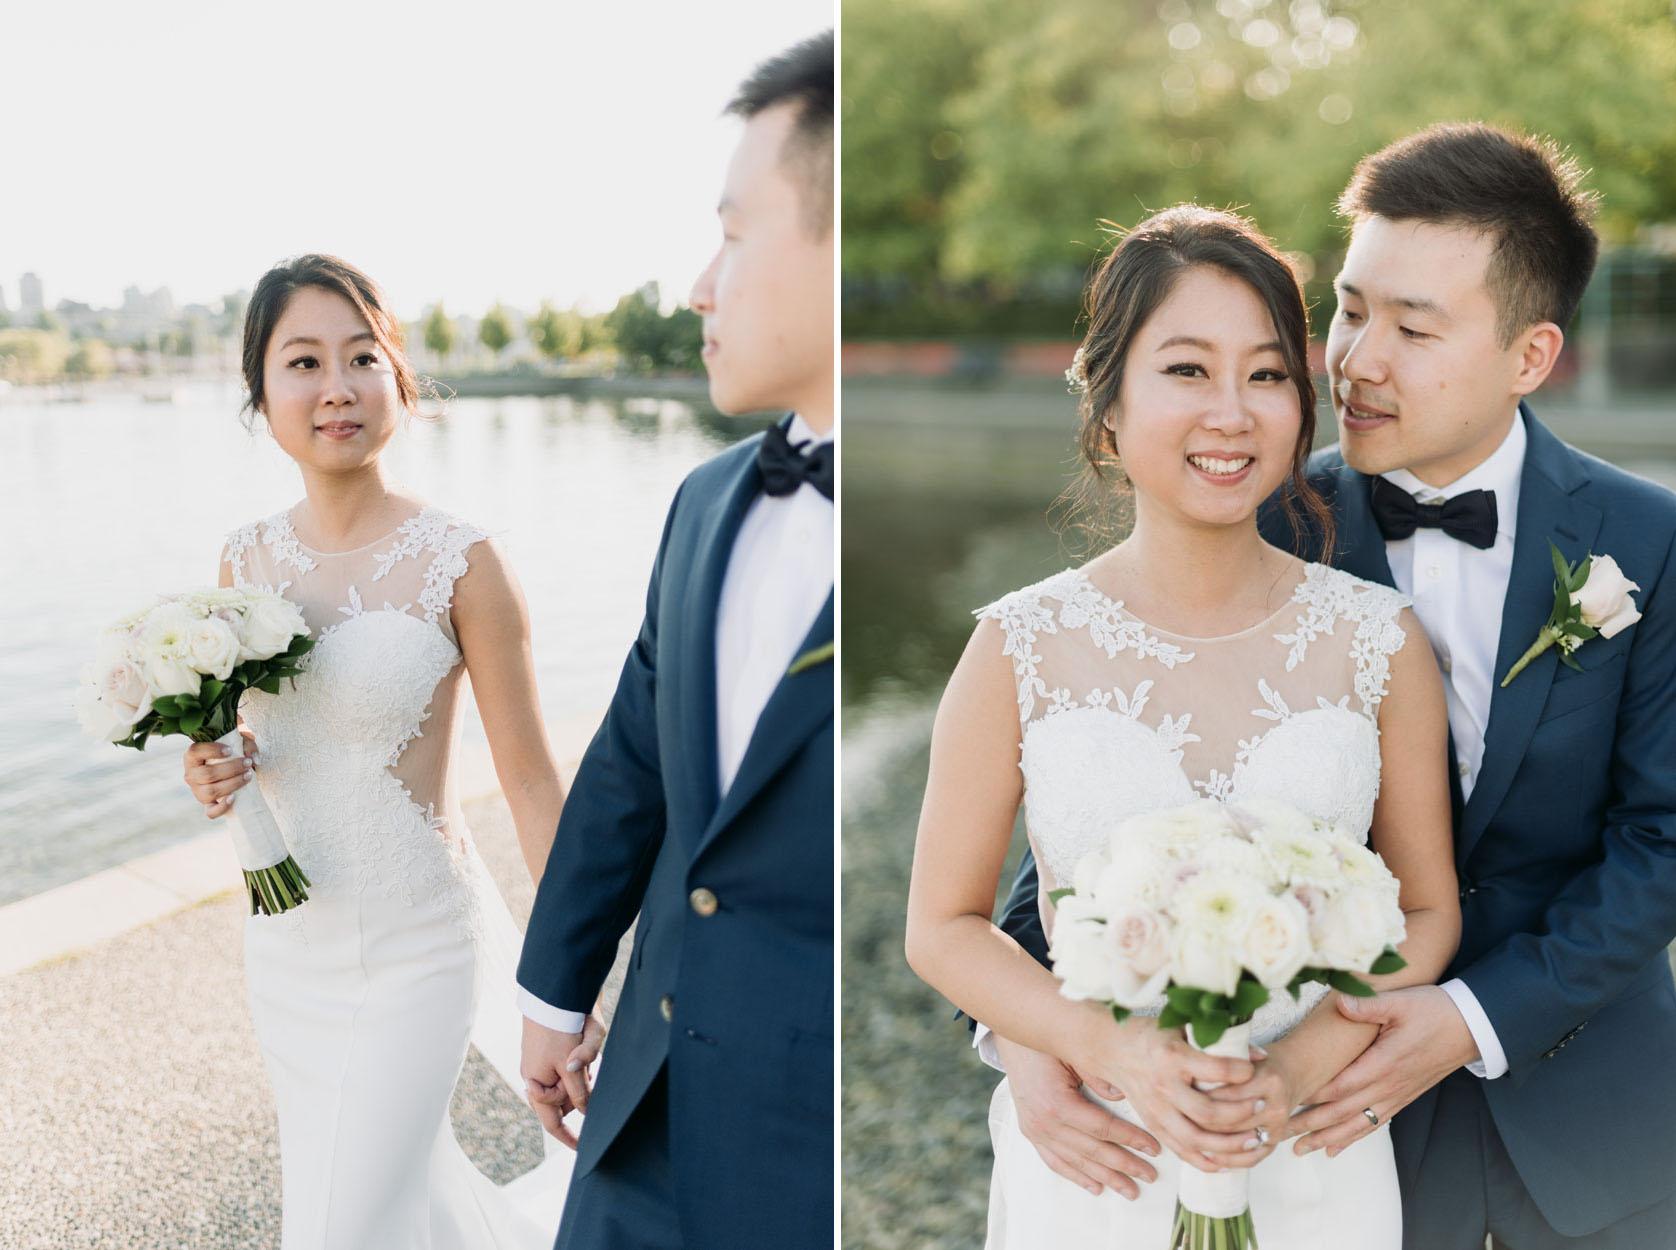 yaletown-wedding-28.jpg